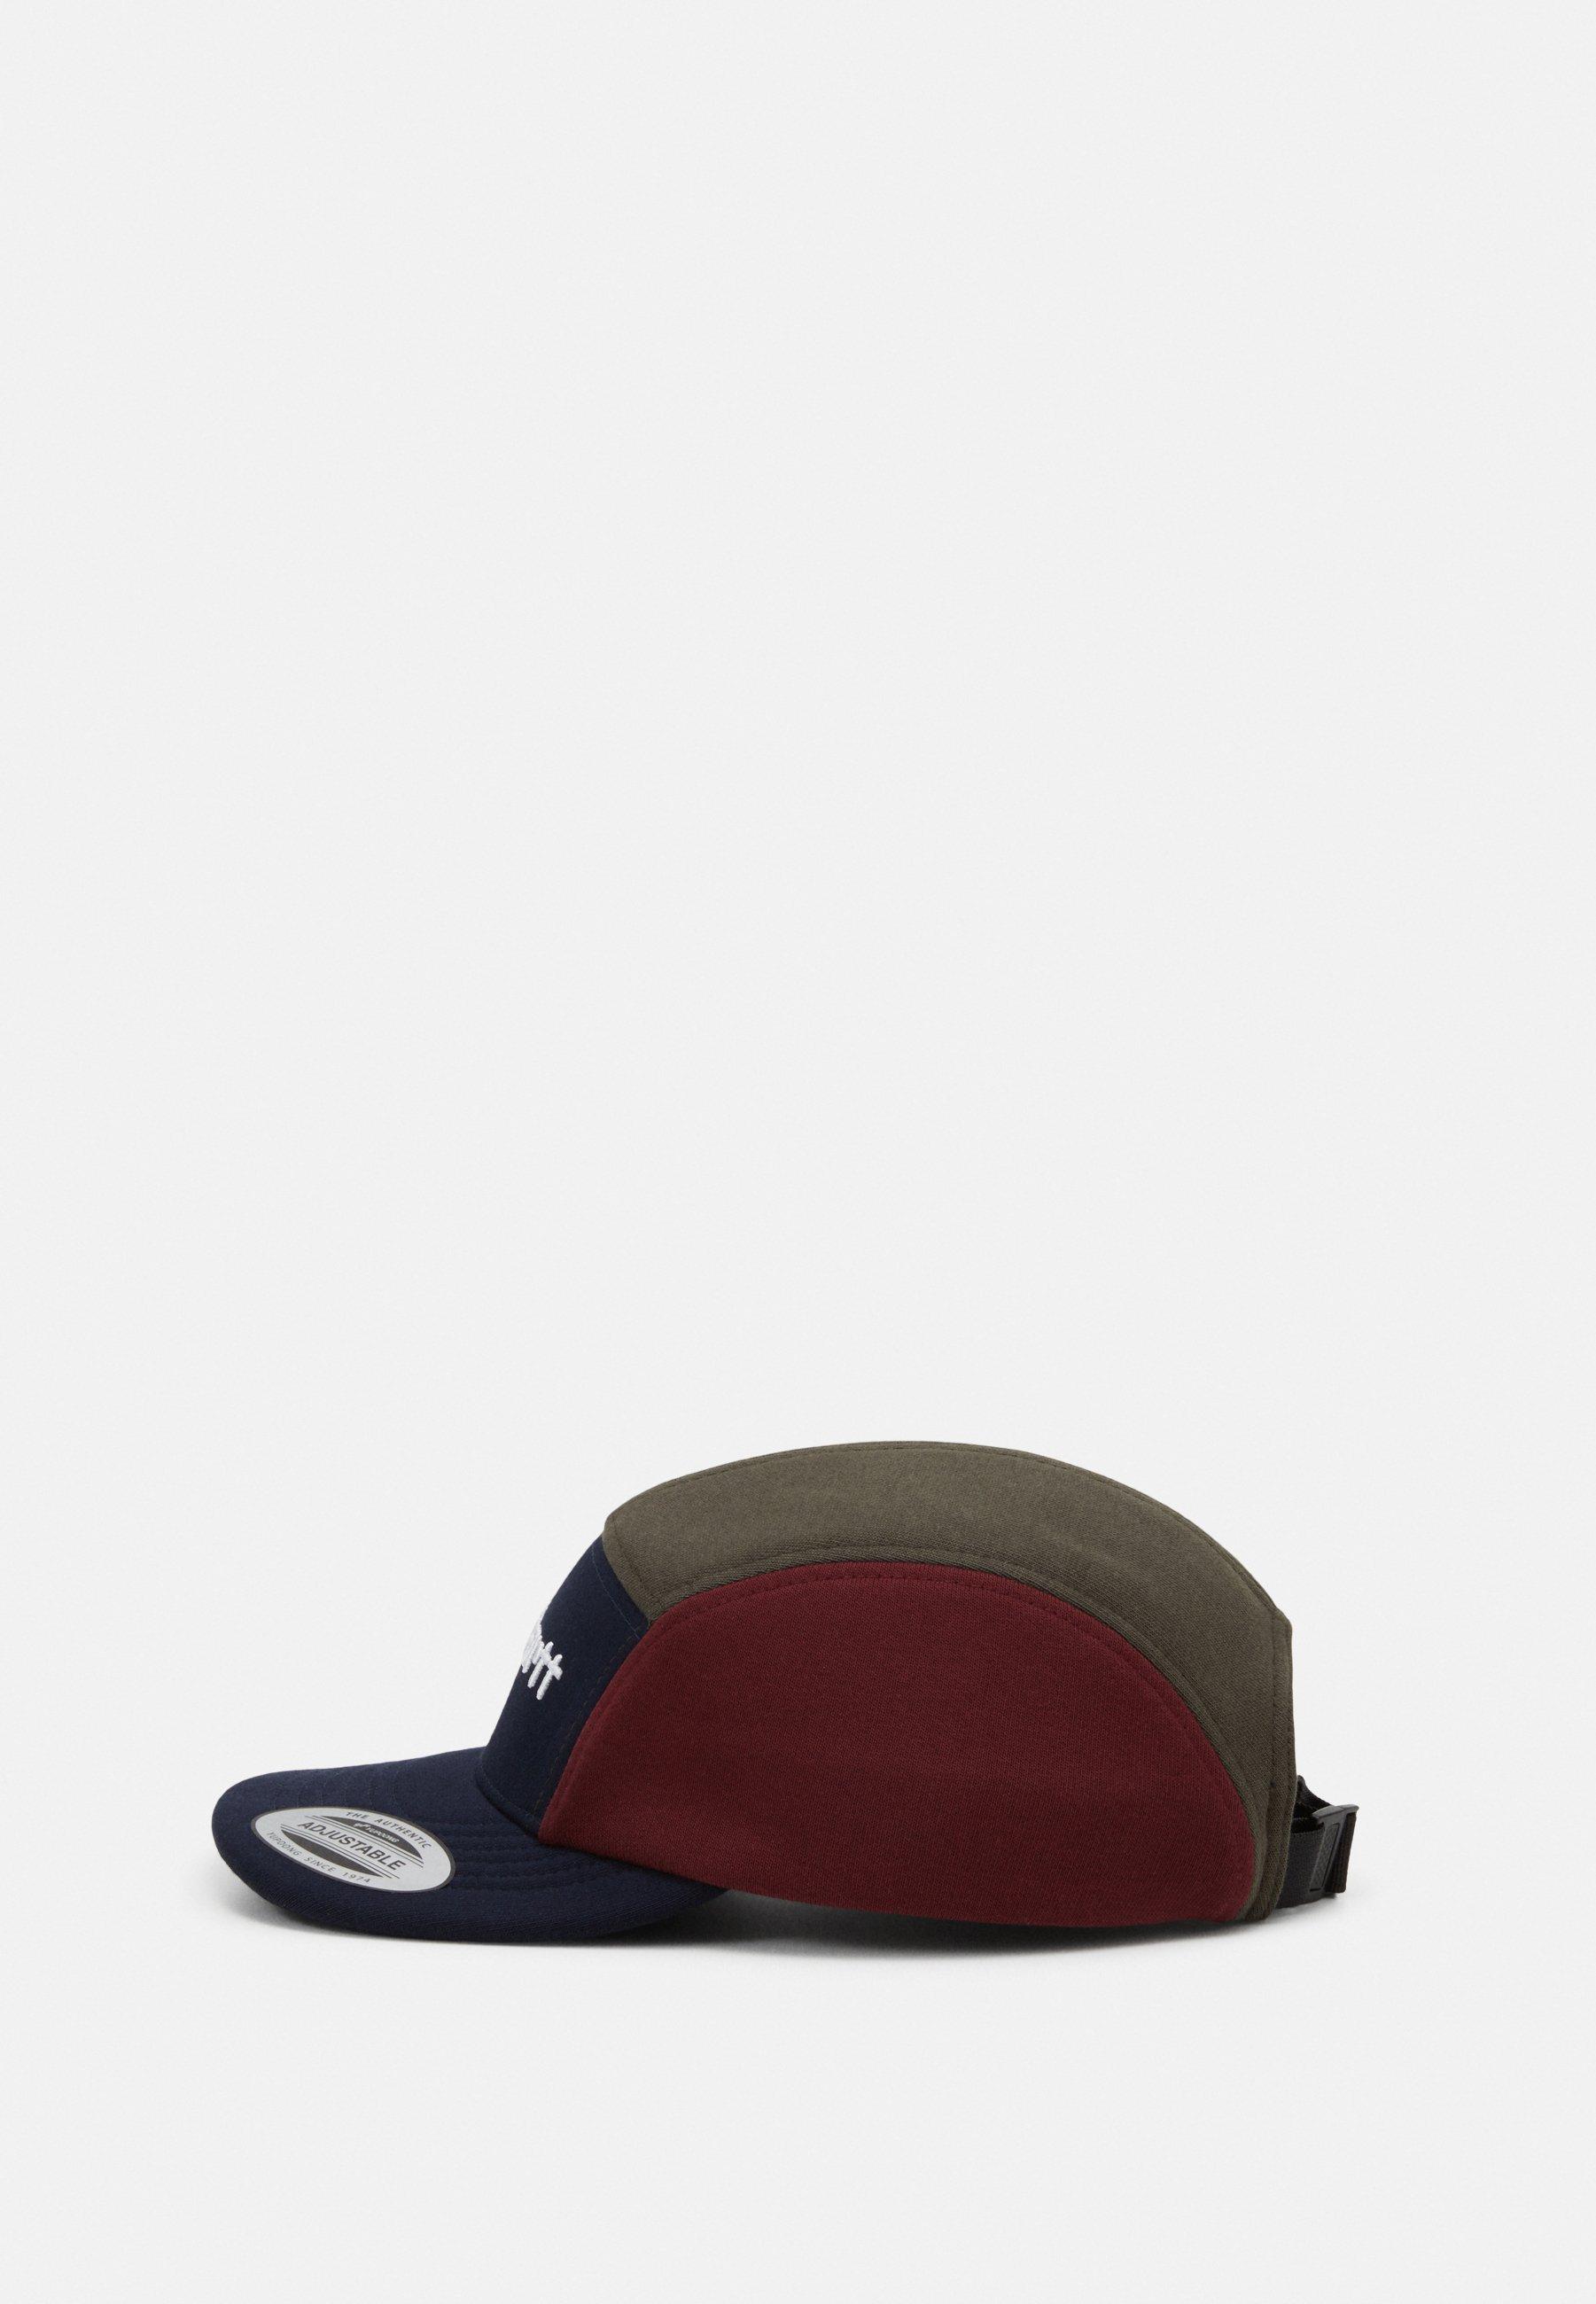 Carhartt Wip Tricol - Cap Dark Navy/cypress/bordeaux/dunkelblau